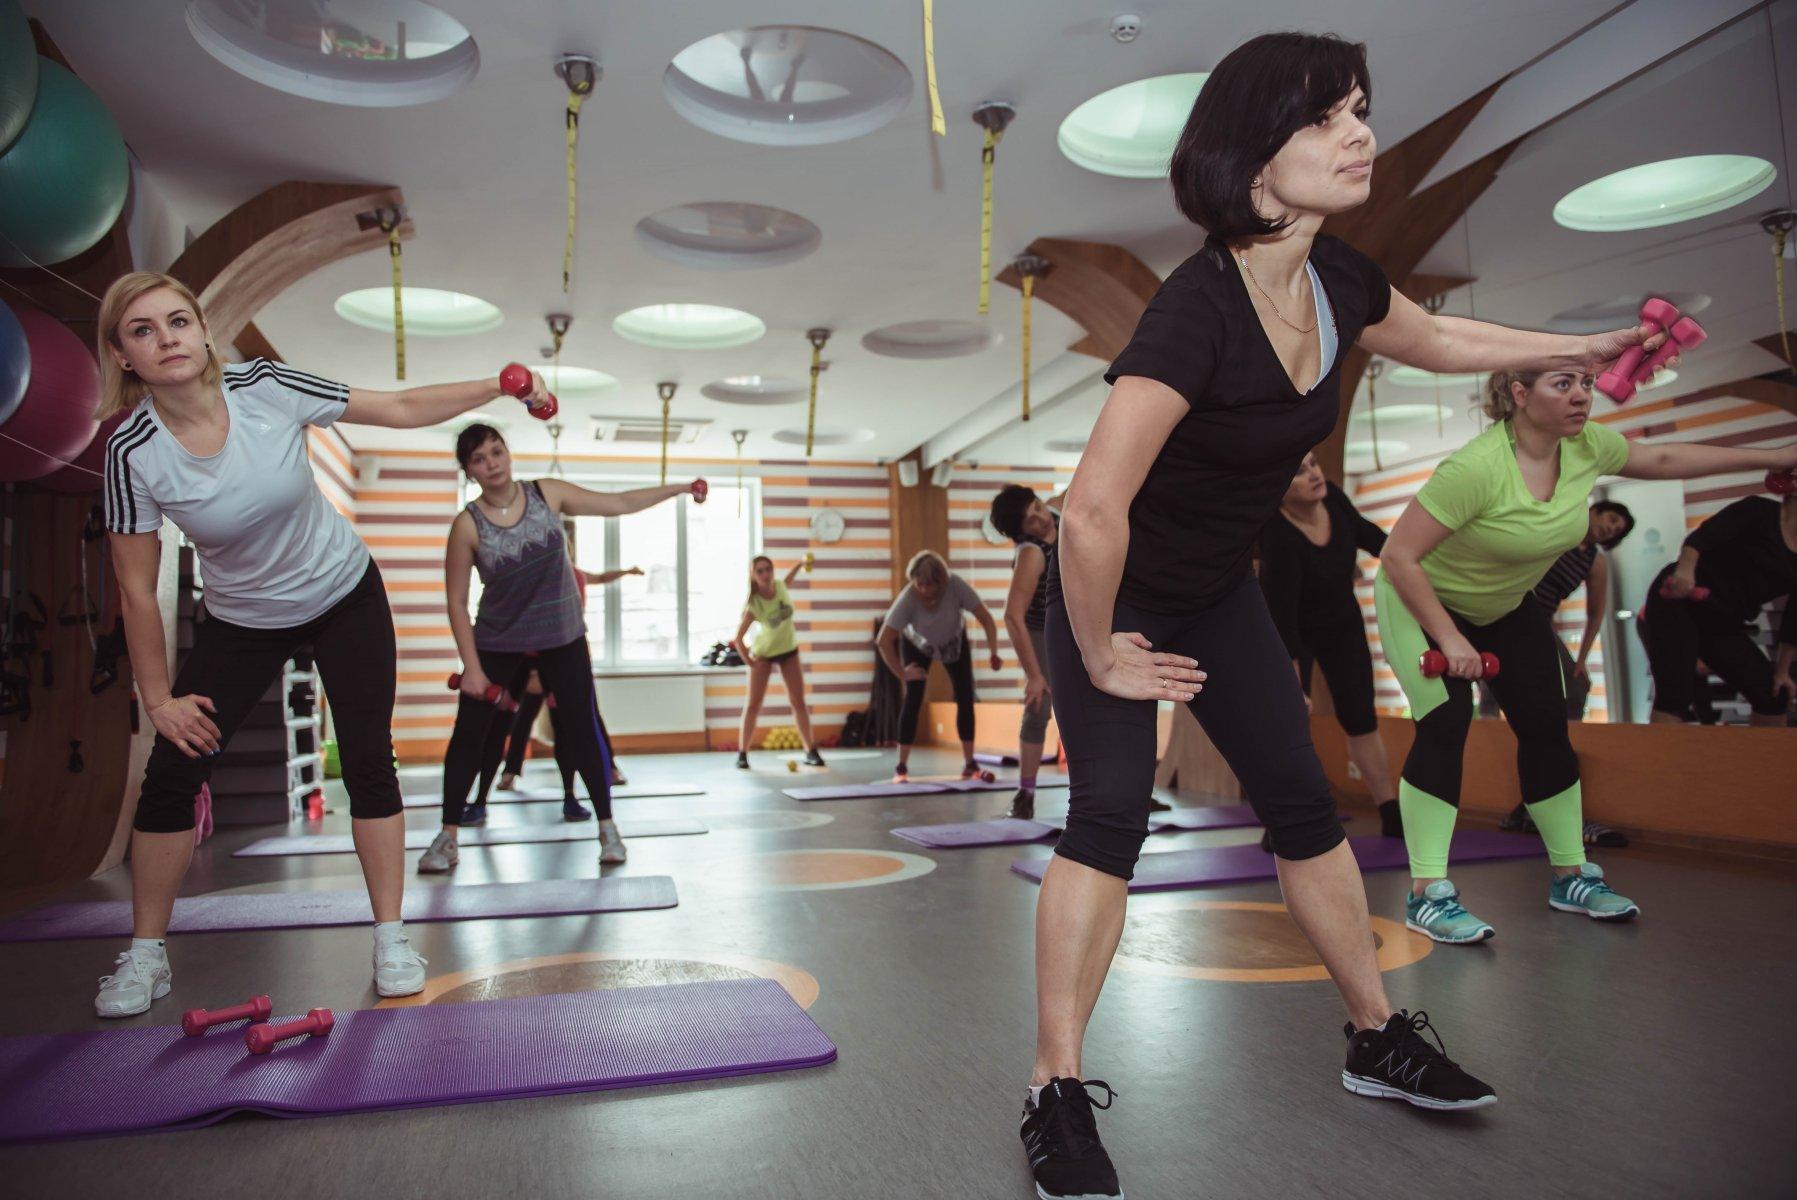 фитнес-клуб Железяка и Бантики